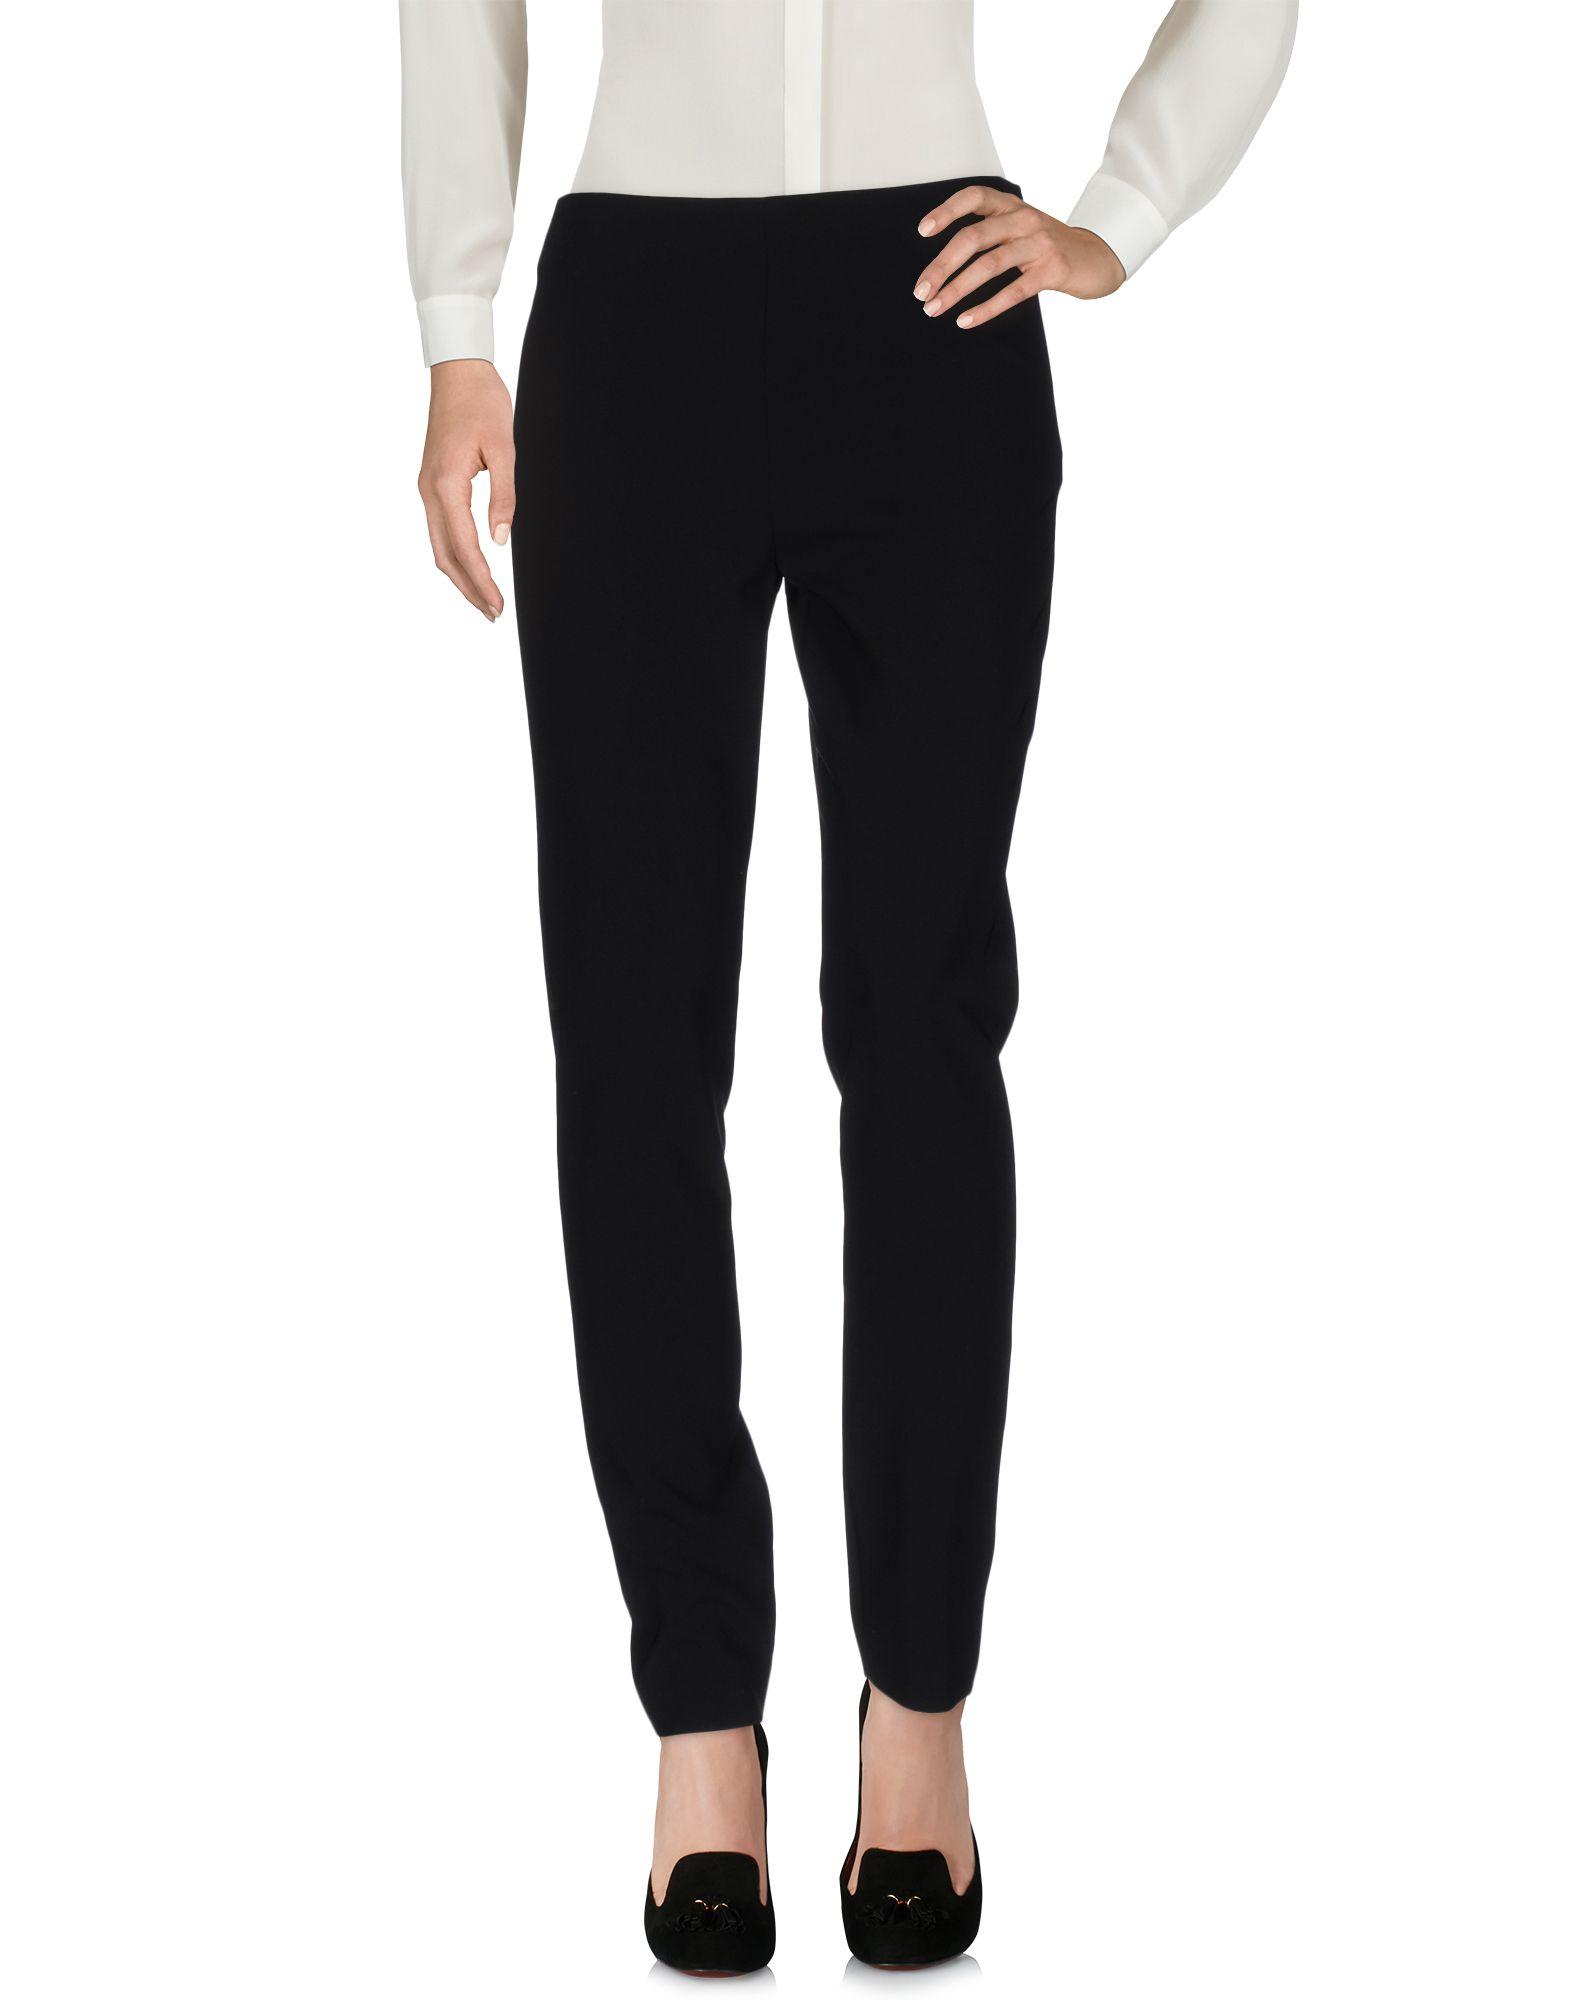 Pantalone Moschino Donna - Acquista online su JynAE1J